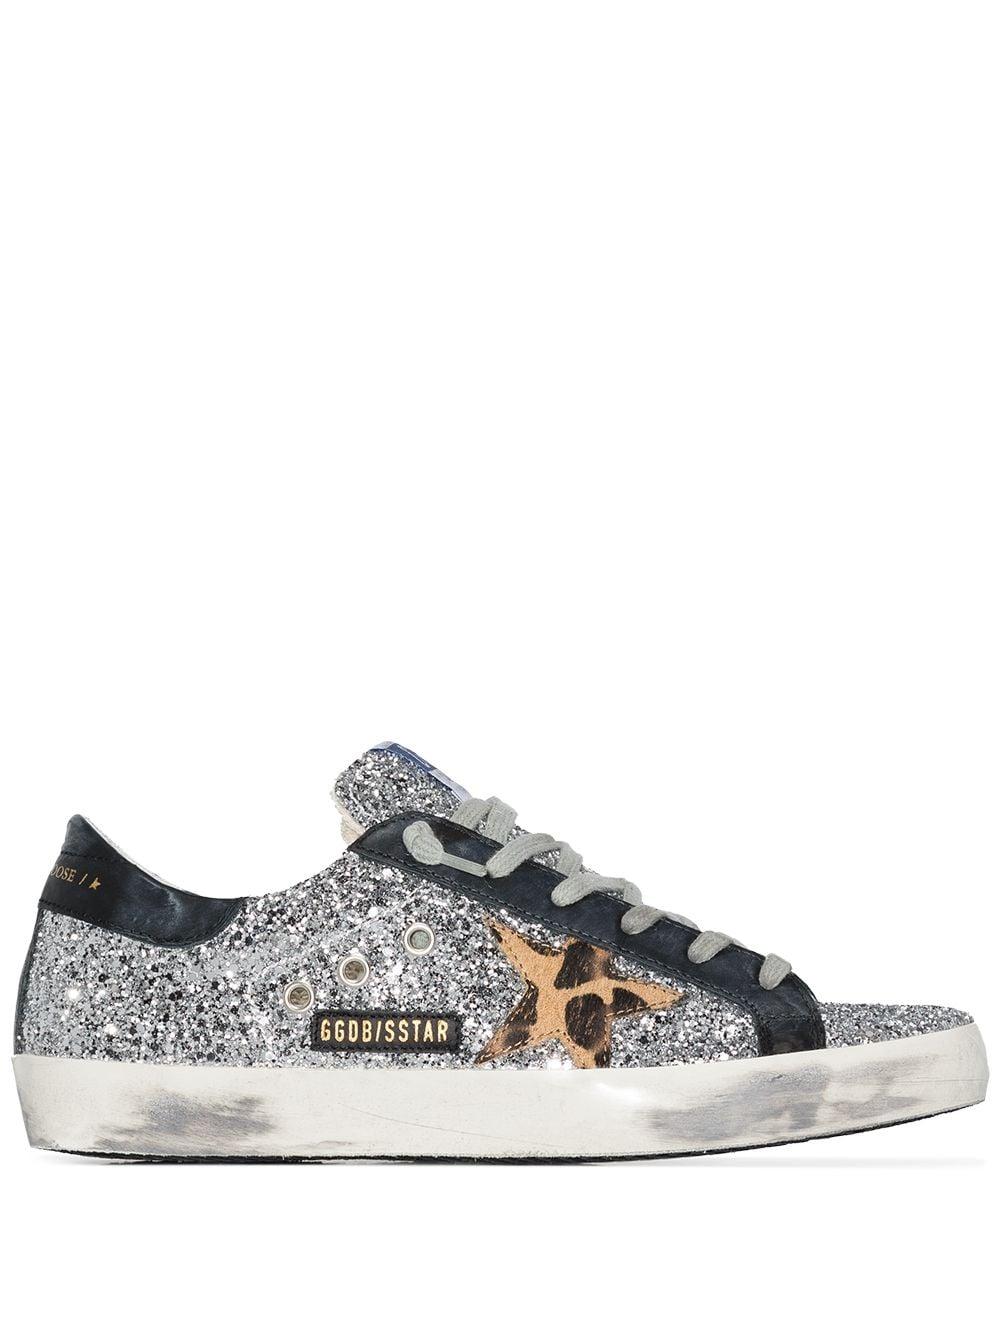 Picture of Golden Goose Deluxe Brand | Superstar Glitter Sneakers